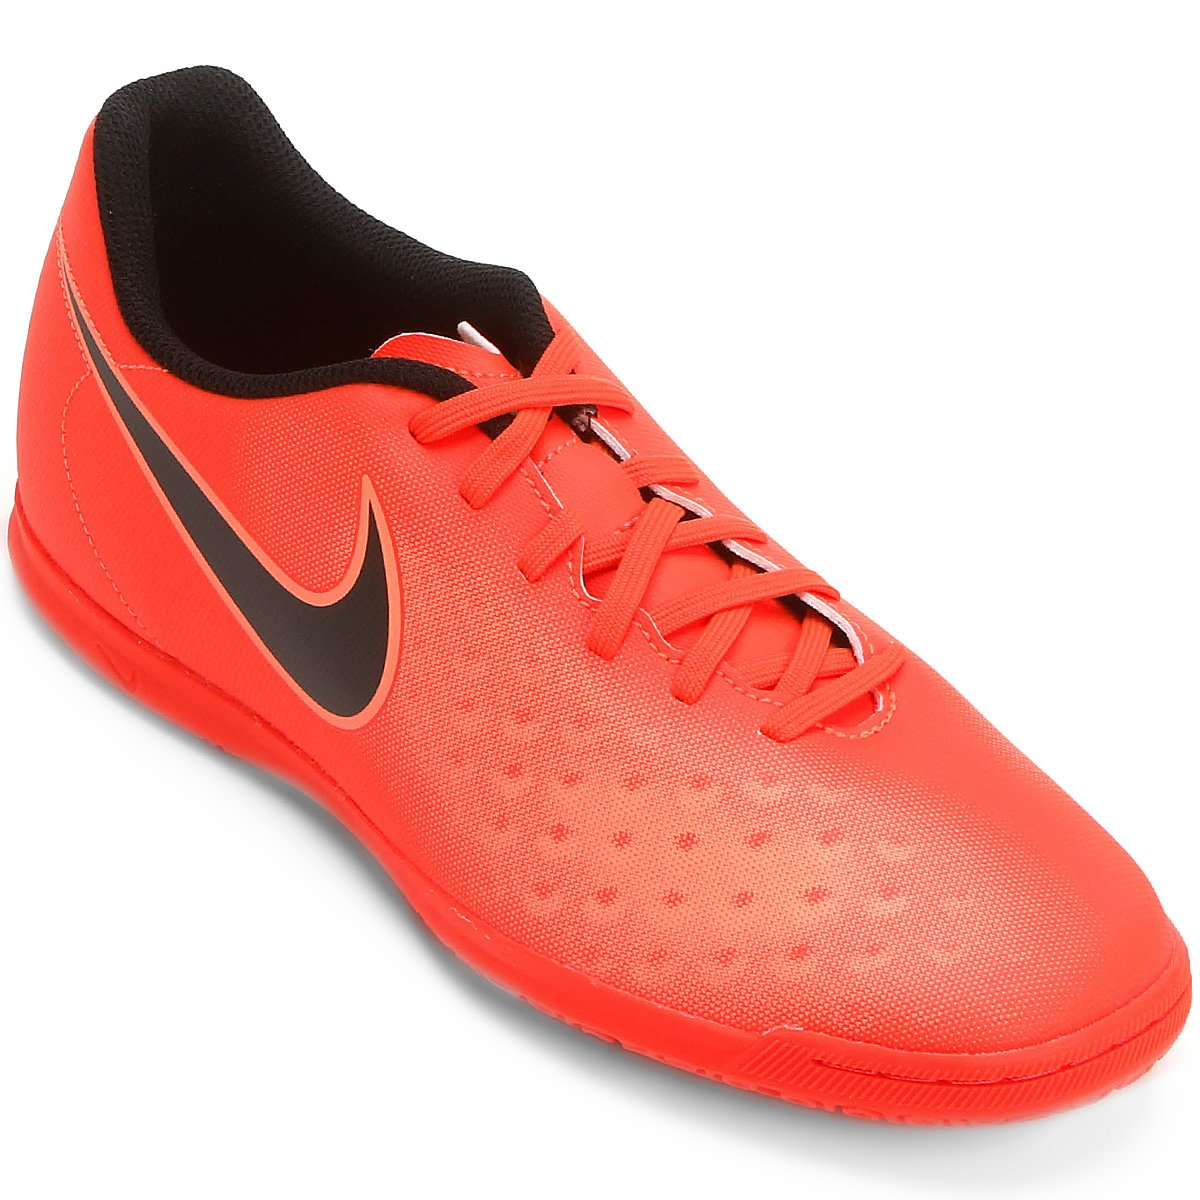 b887b3fc2c Chuteira Futsal Nike Magista Ola II IC Masculina - Compre Agora ...